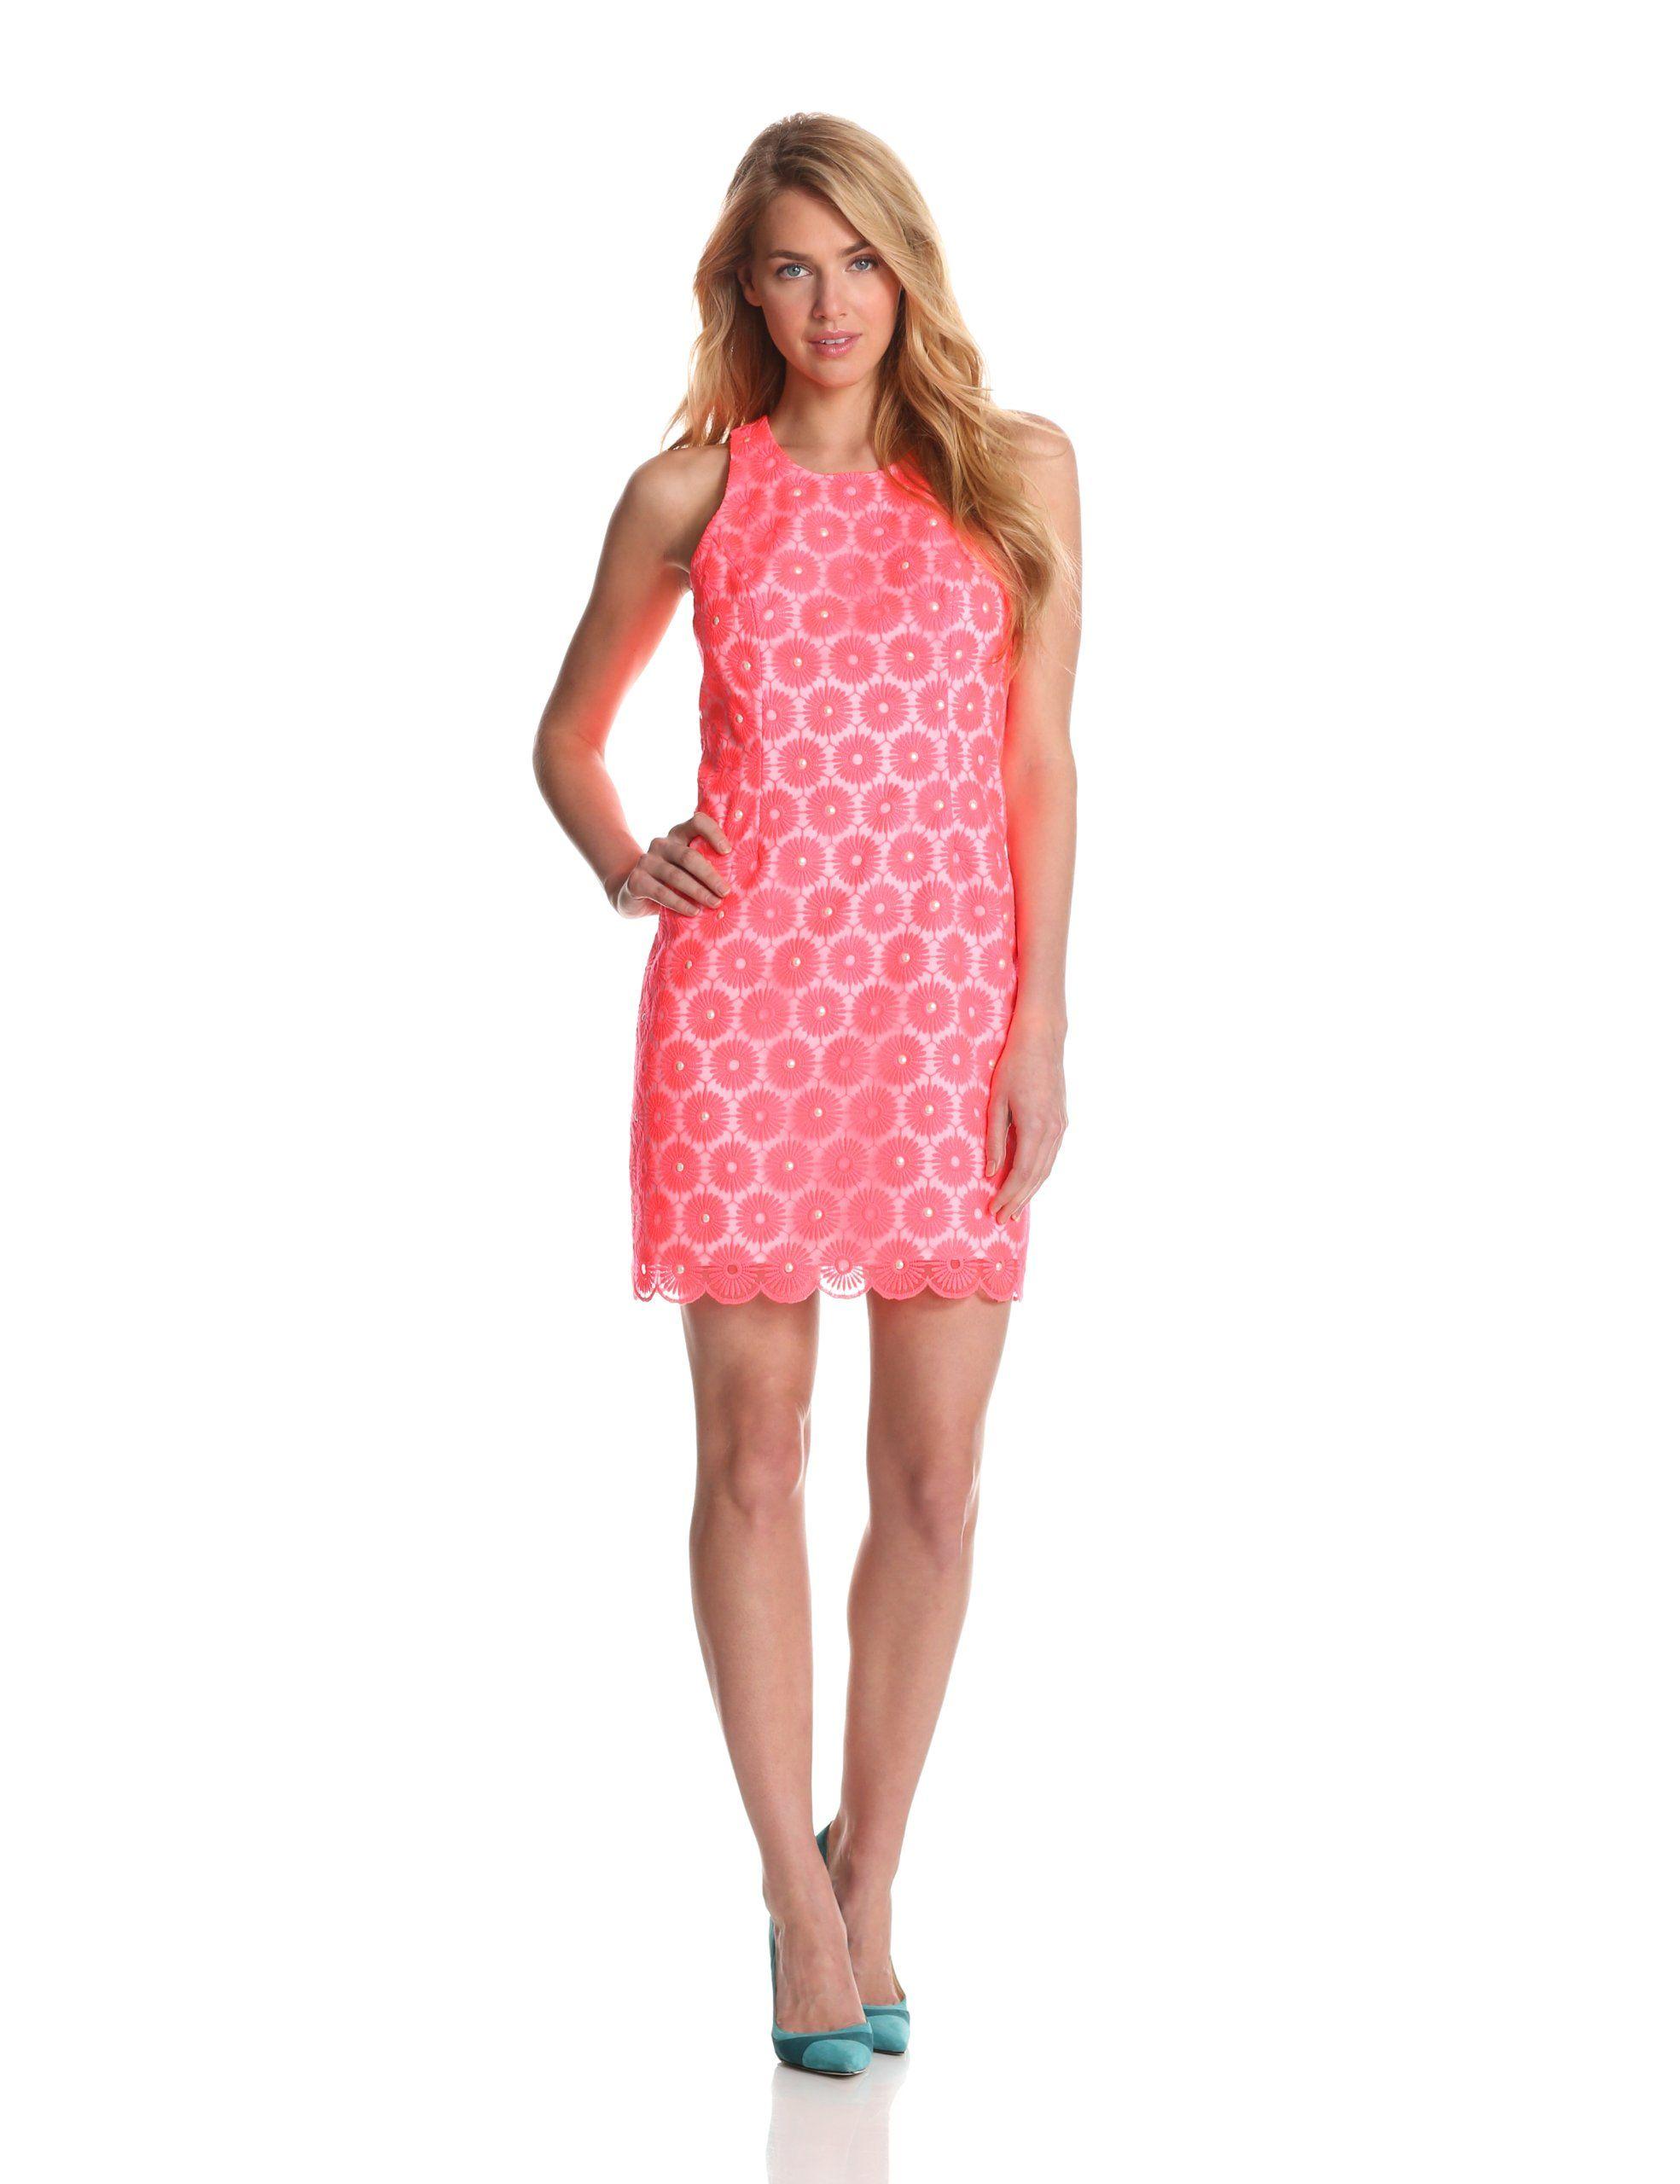 Lilly Pulitzer Women\'s Pearl Dress, Fiesta Pink, 8 | Amazon.com ...